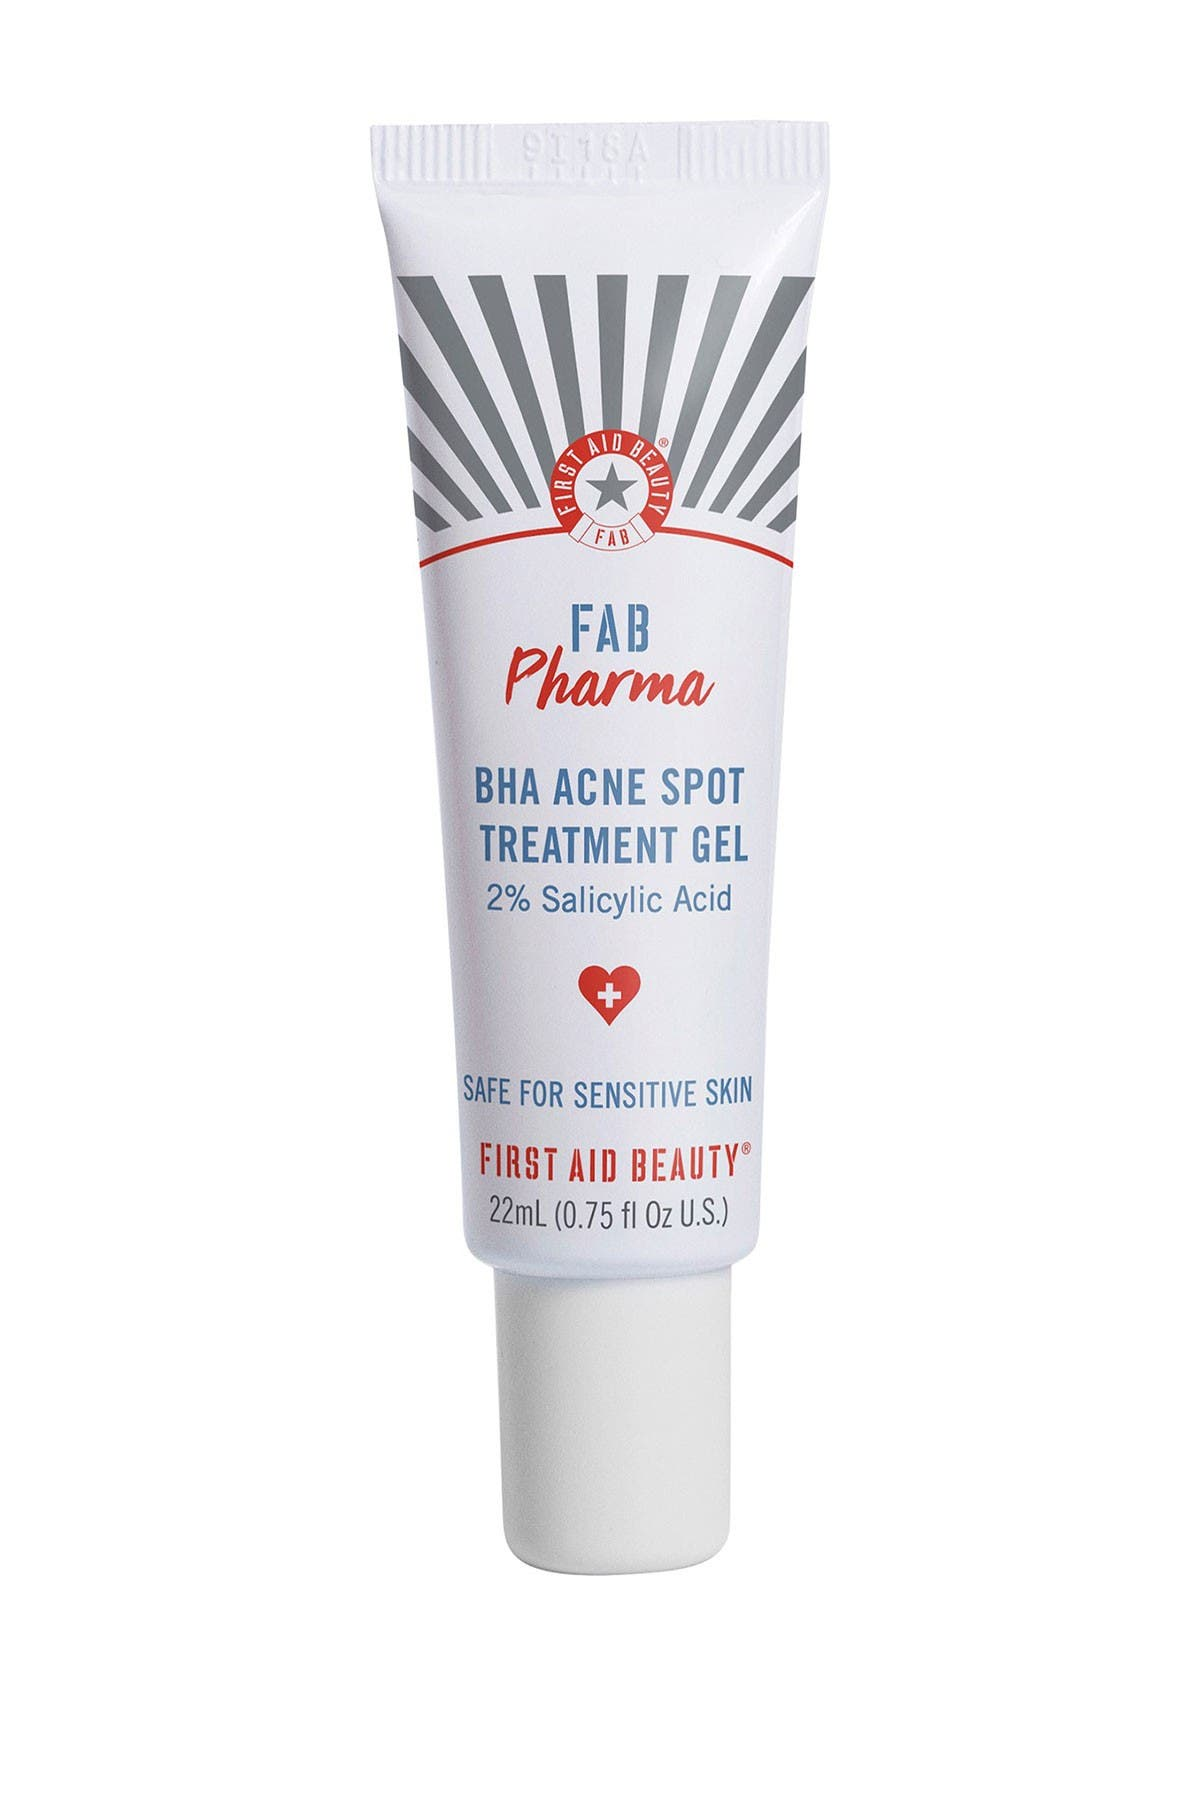 Image of FIRST AID BEAUTY FAB Pharma BHA Acne Spot Treatment Gel 2% Salicylic Acid